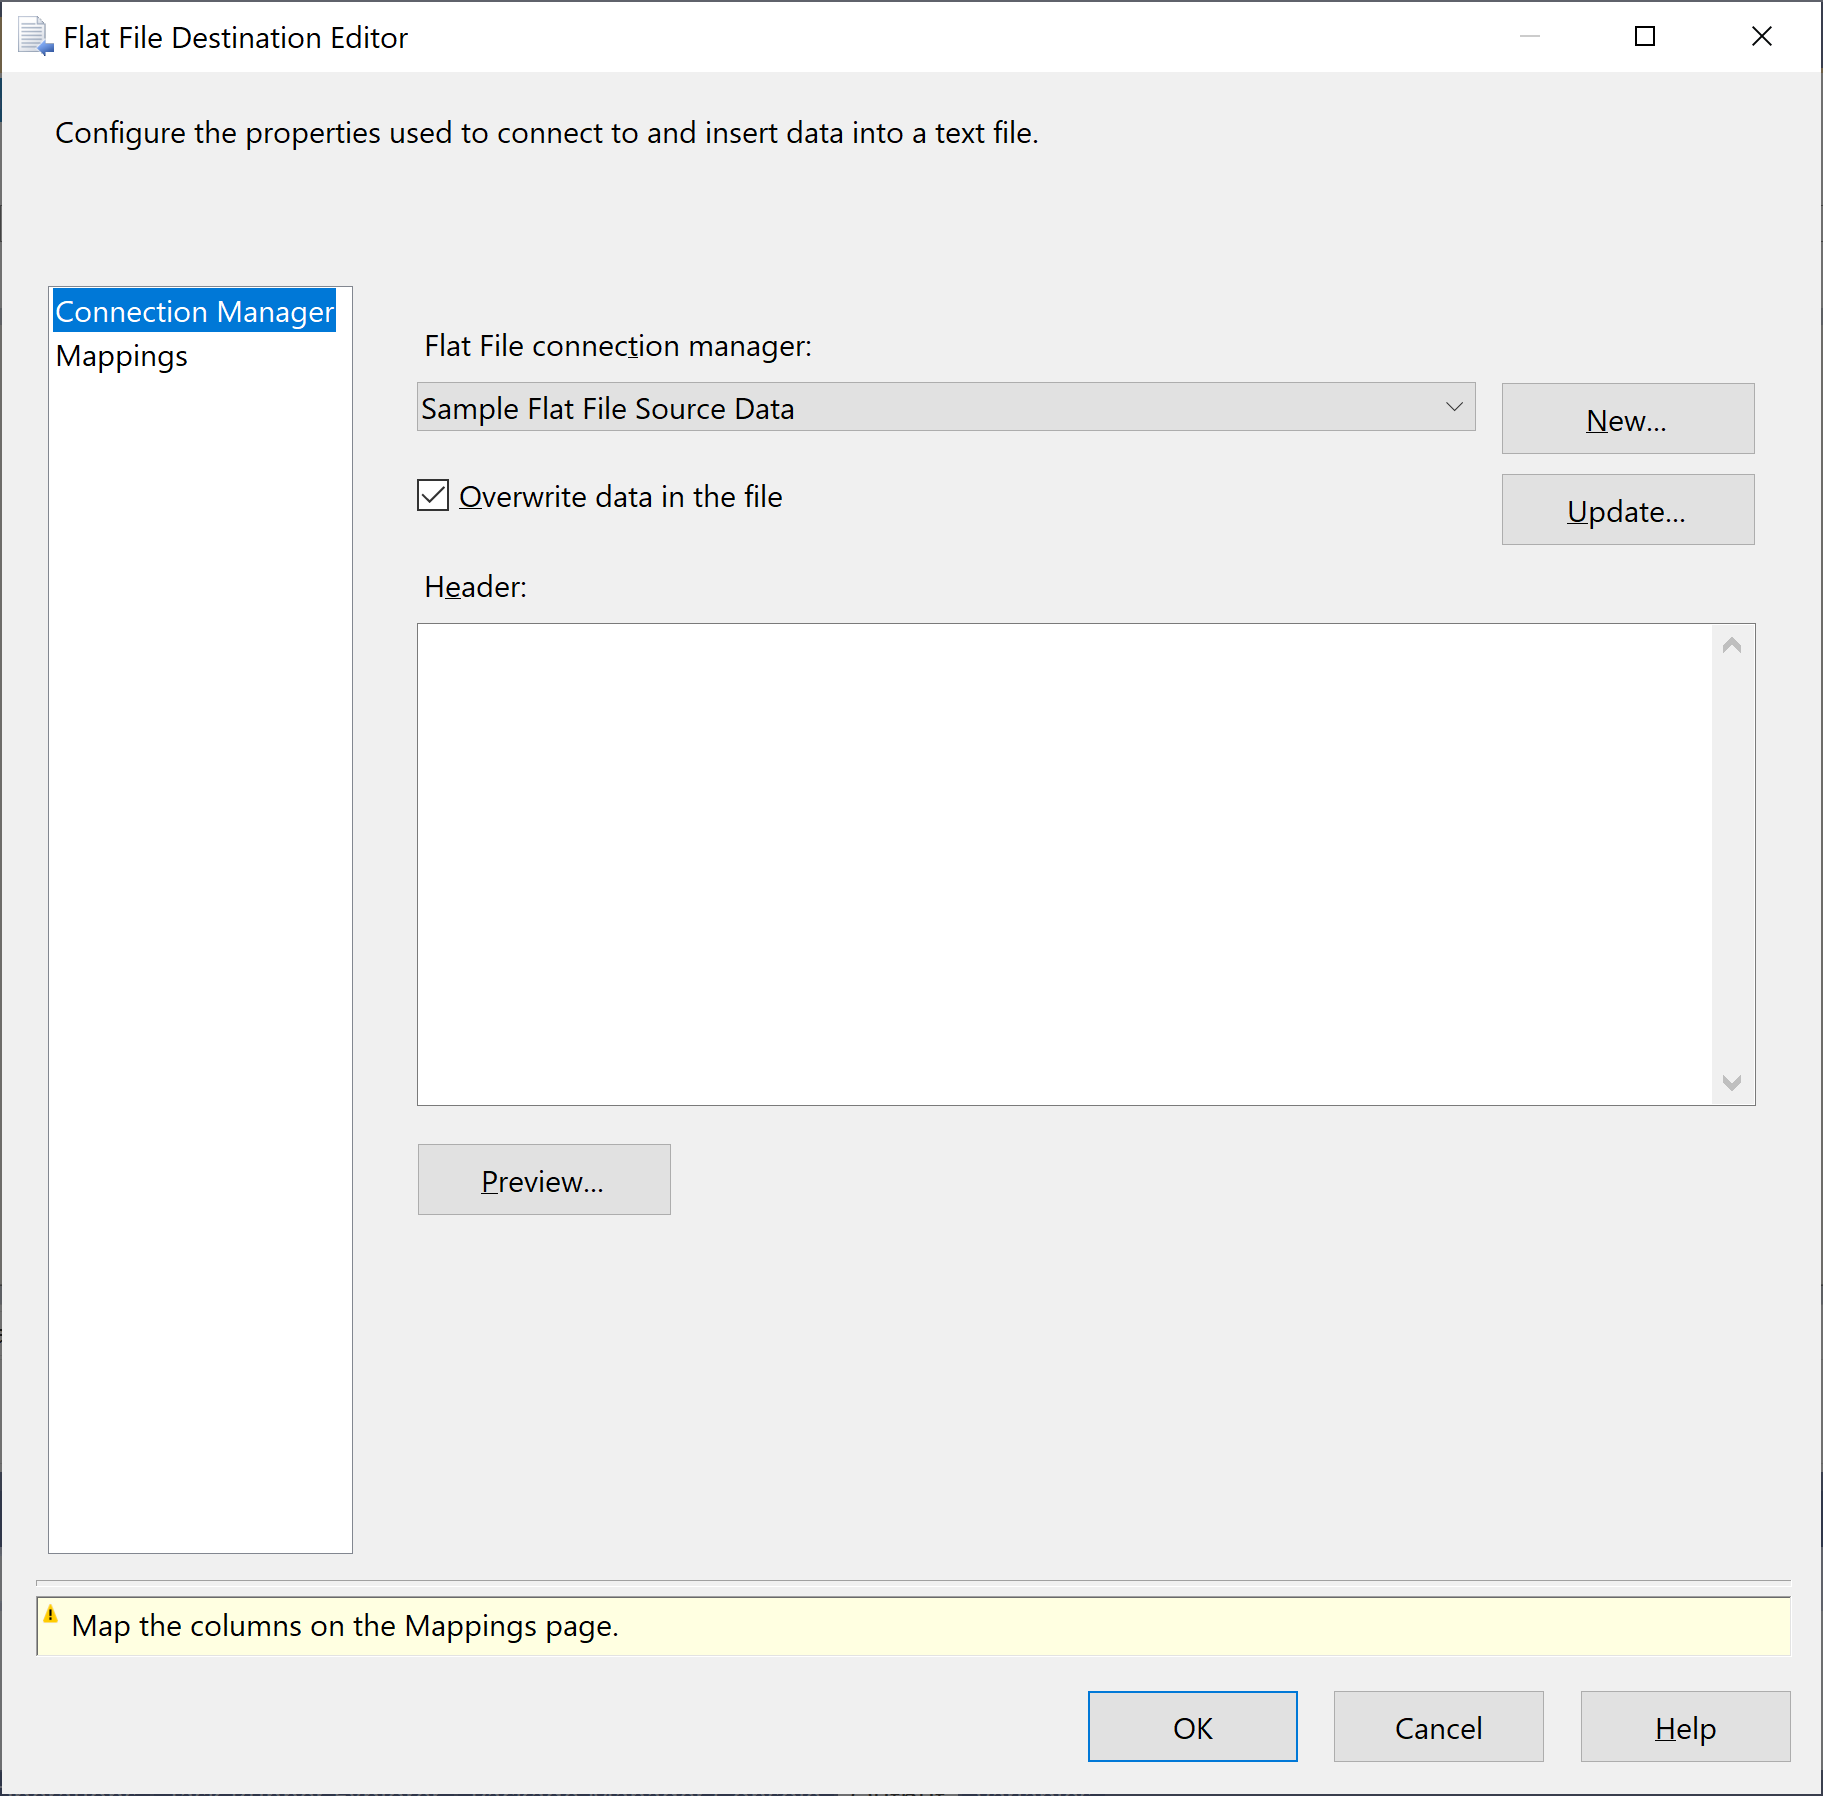 Flat File Destination Editor